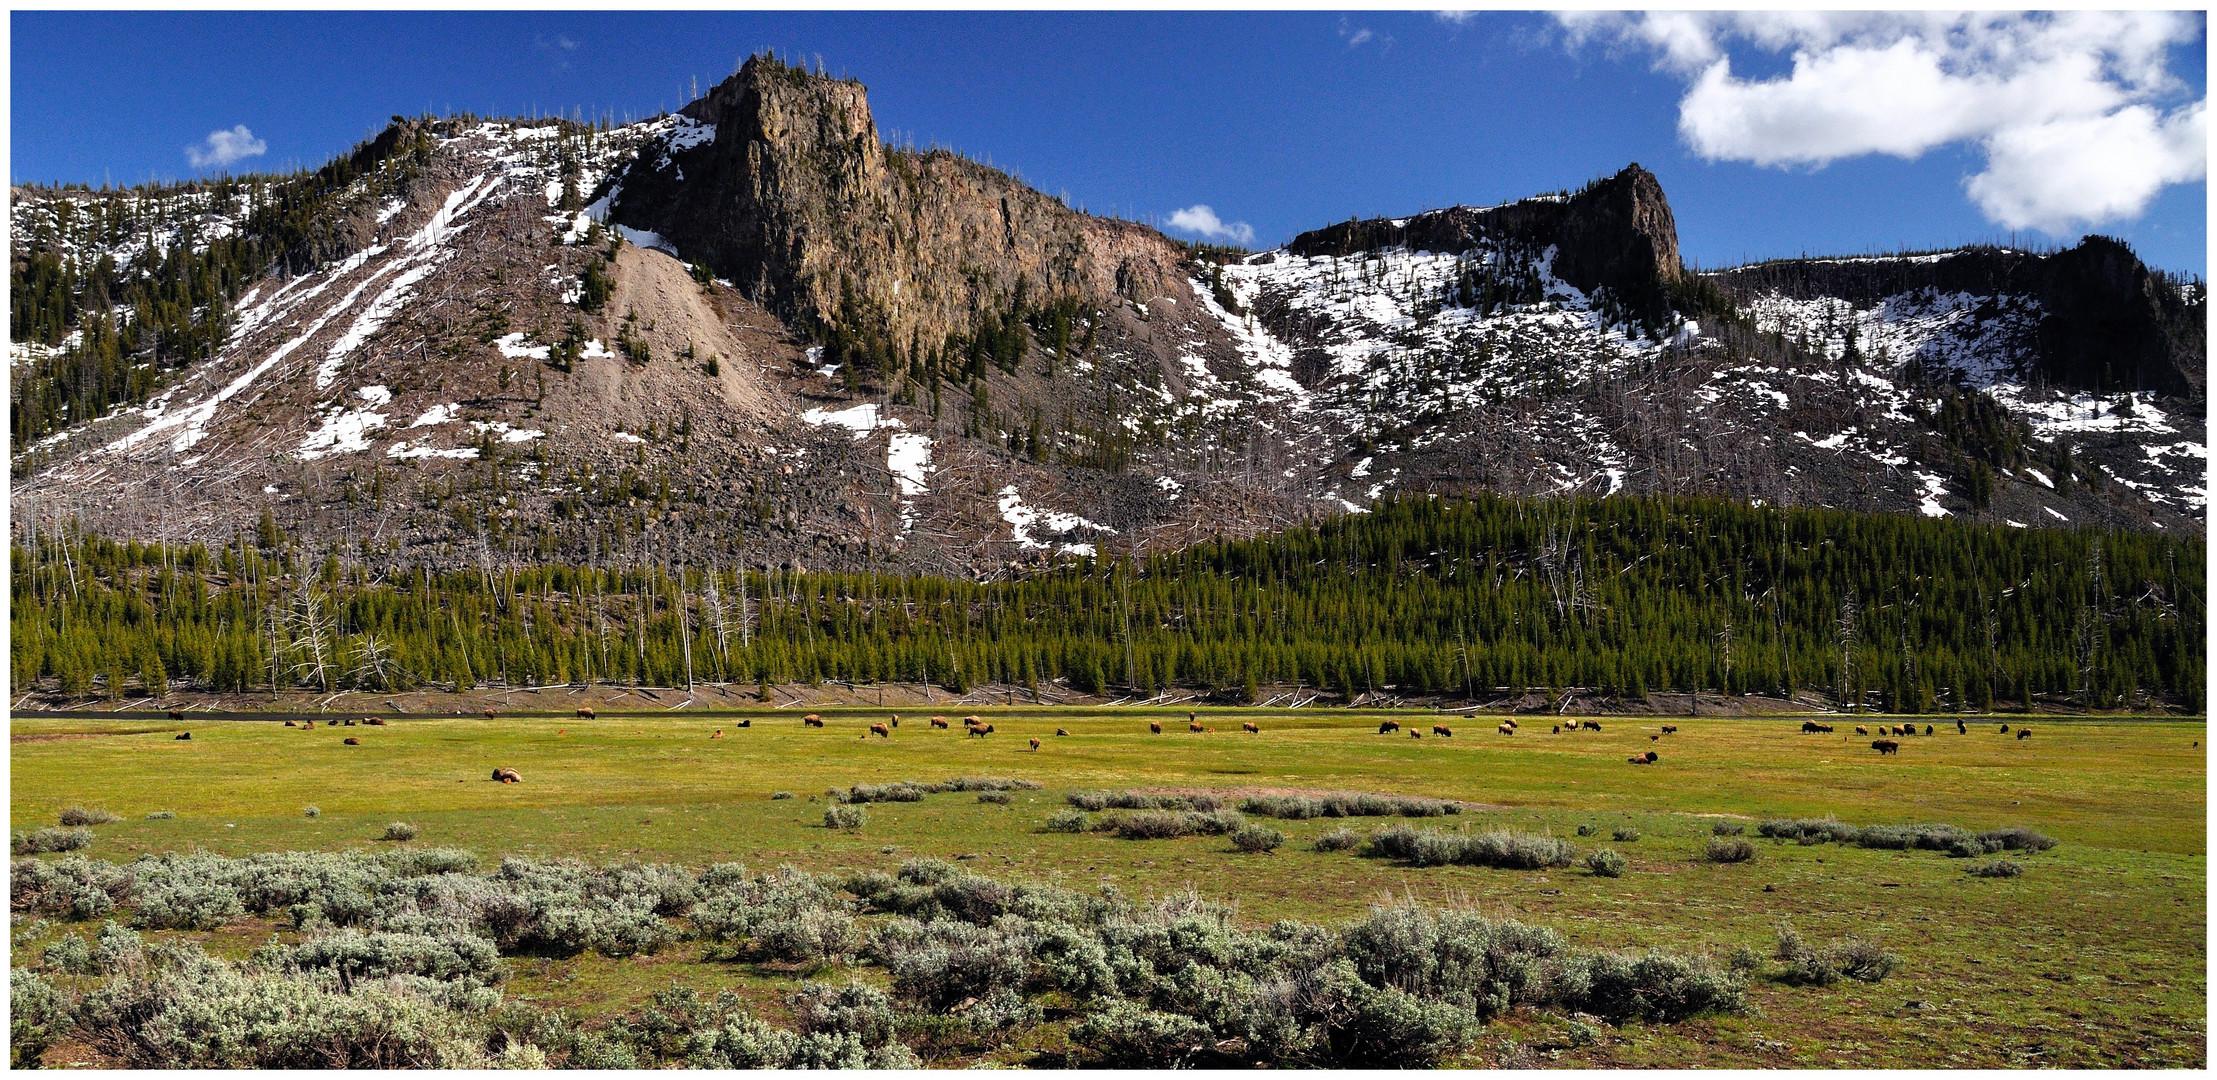 Landschaft im Yellowstone National Park, WY